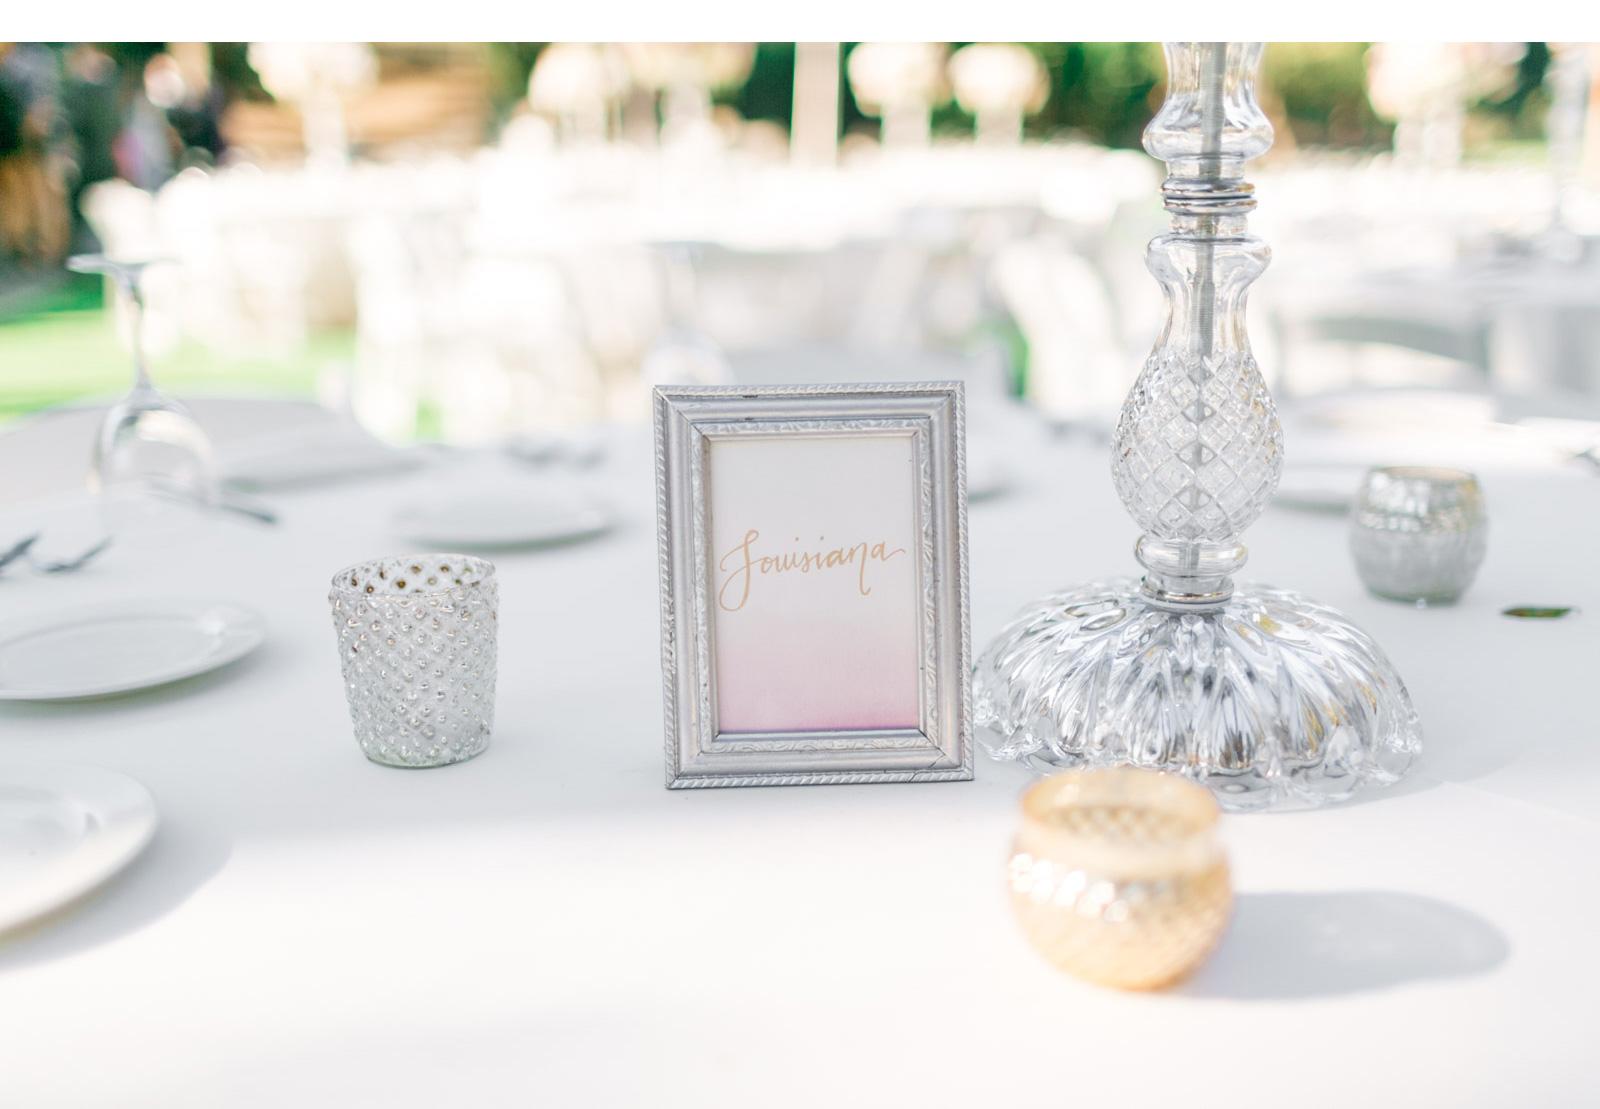 Temecula-Winery-Wedding-Natalie-Schutt-Photography_08.jpg